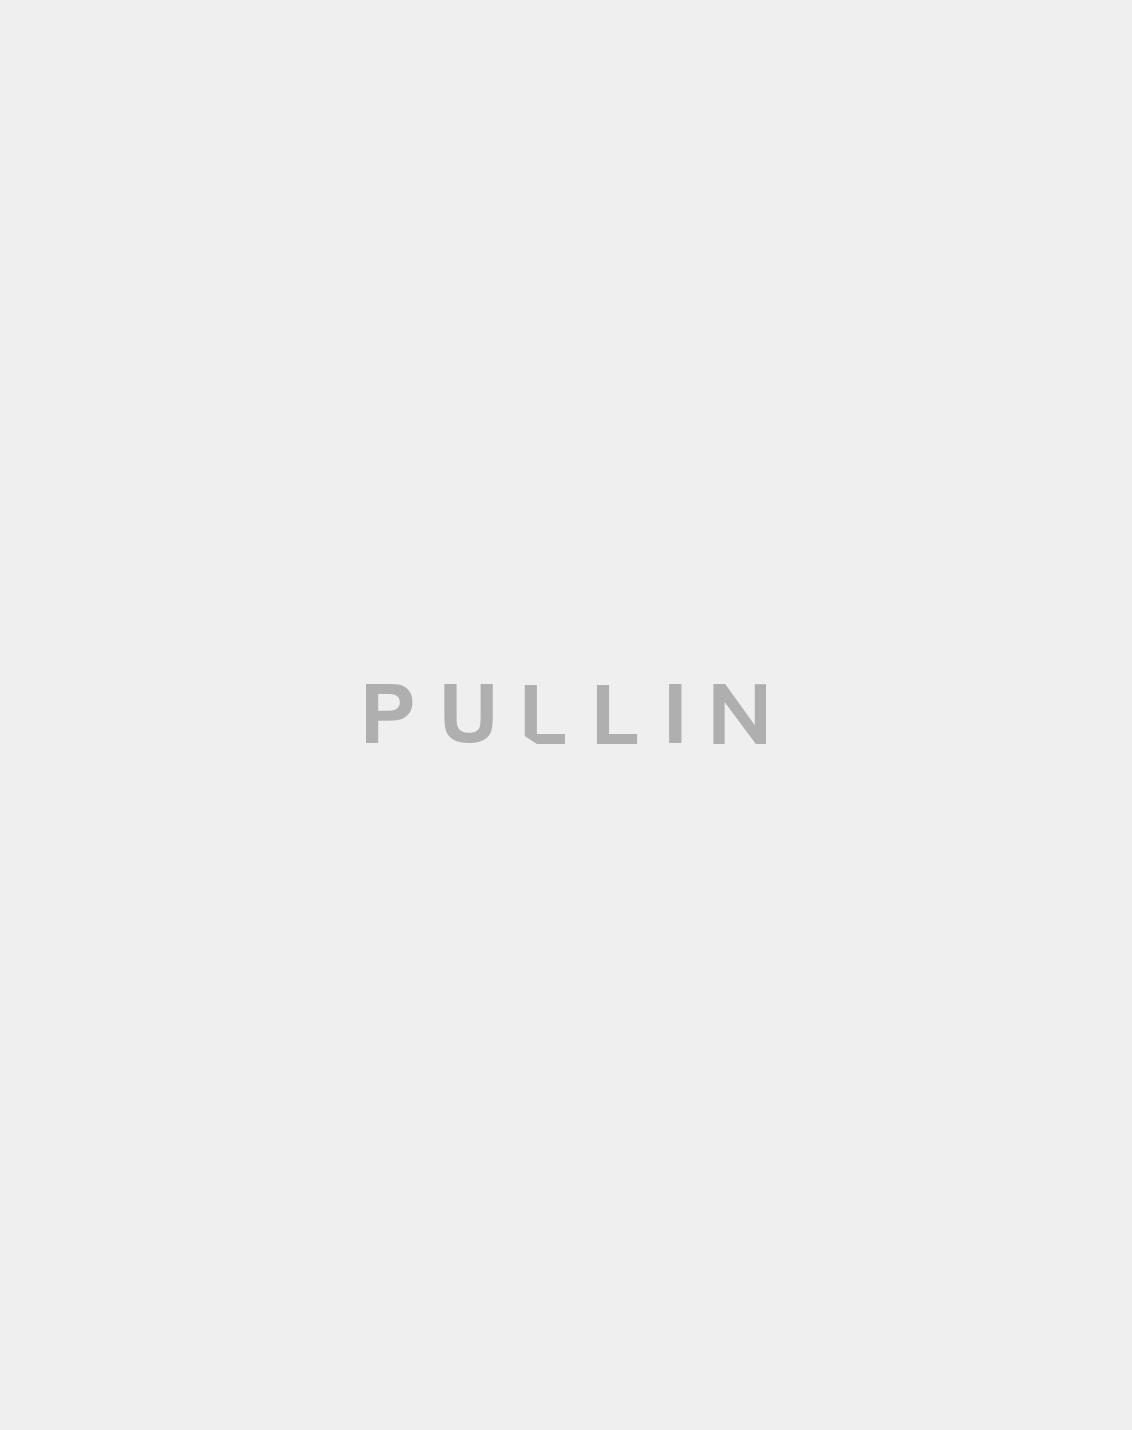 Key holder bp0867 unisex - pullin 1